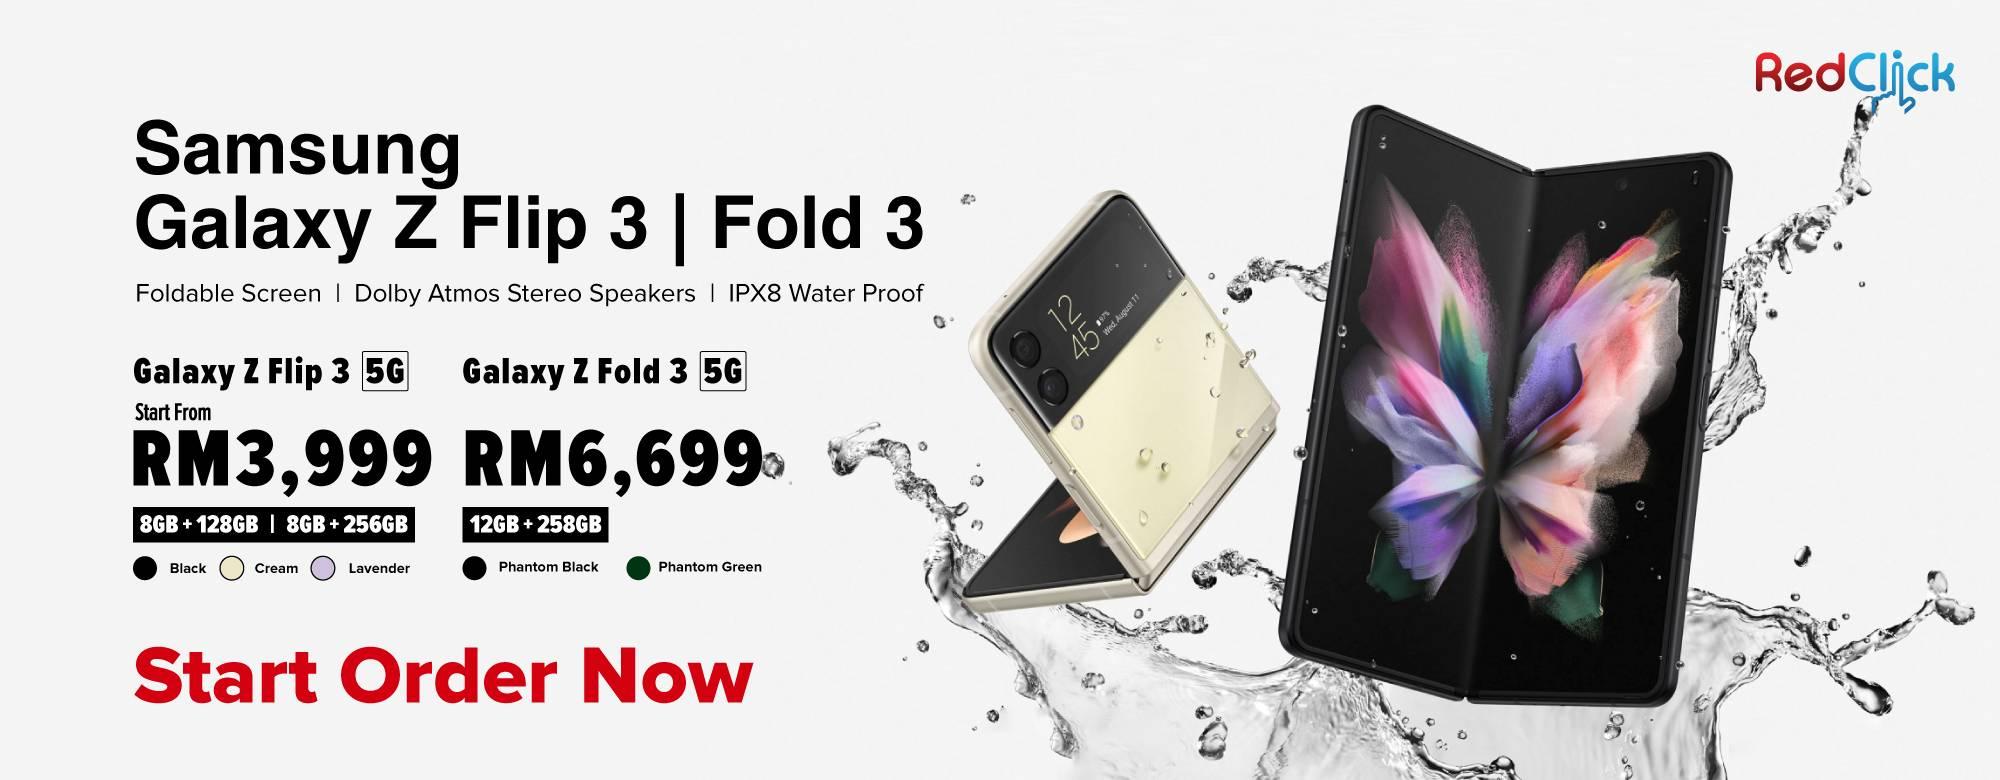 Samsung Galaxy Z Flip 3 & Z Fold 3 5G